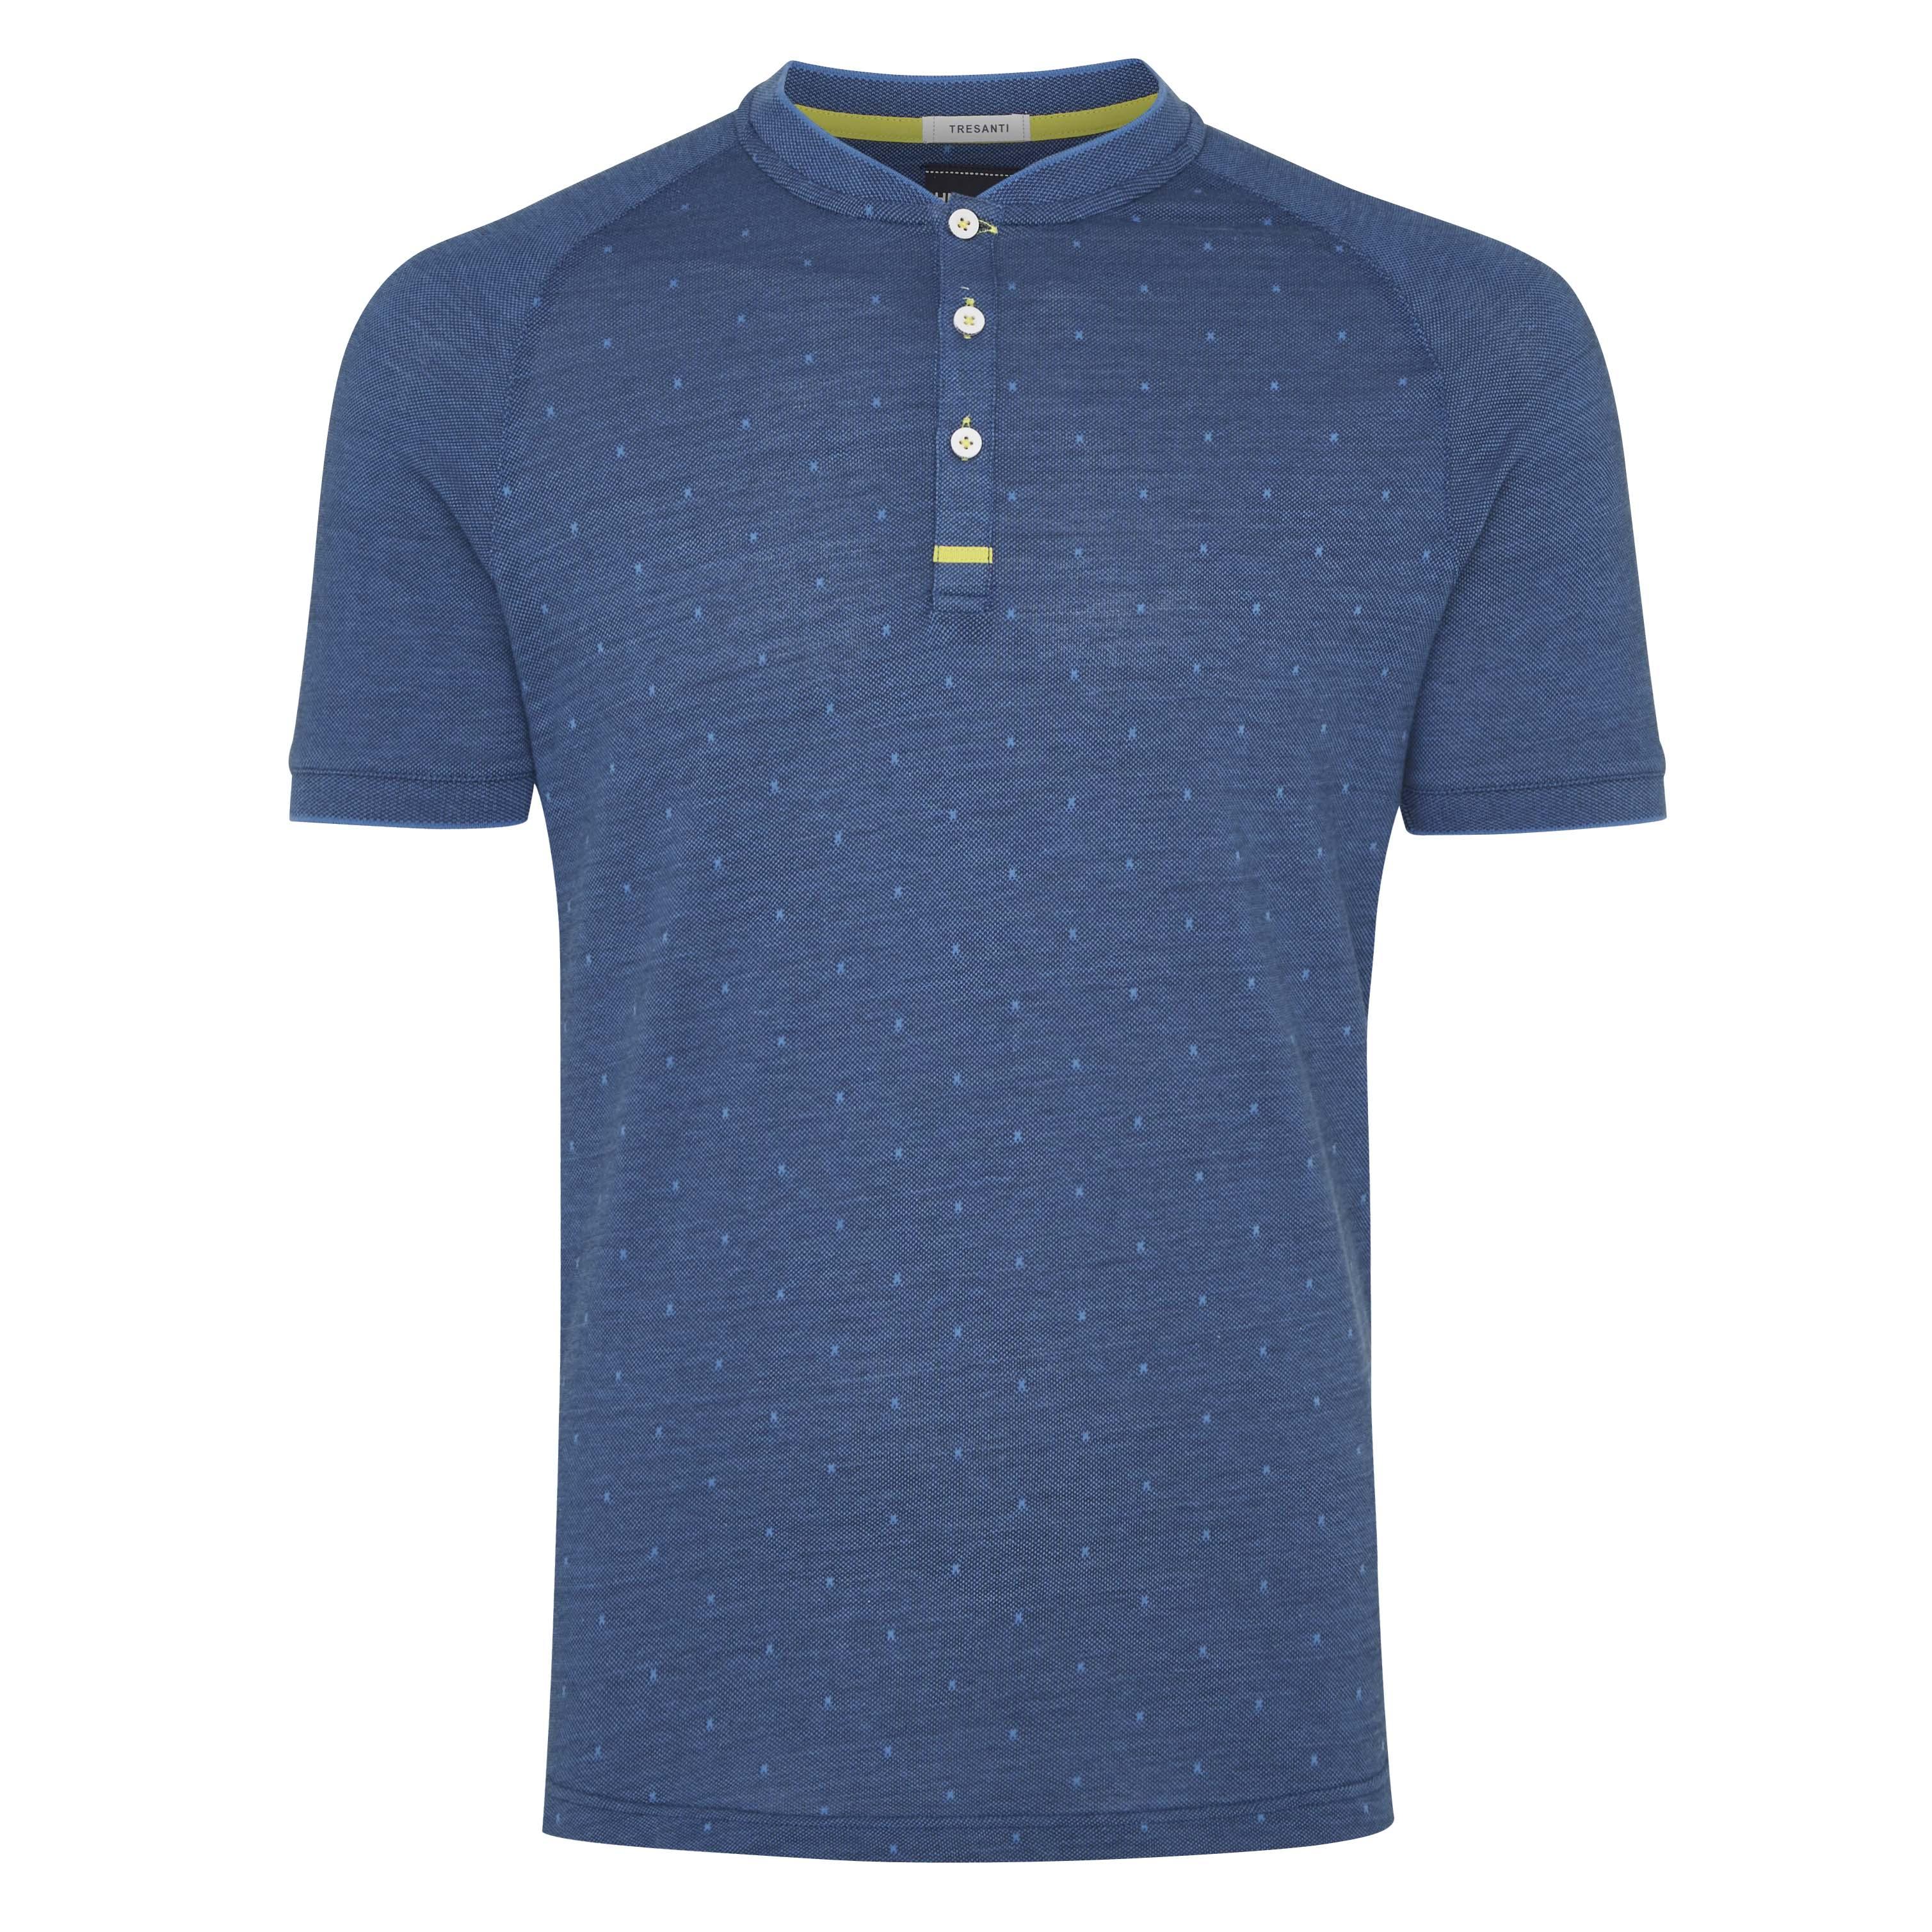 Terrence | T-shirt raglan dark blue